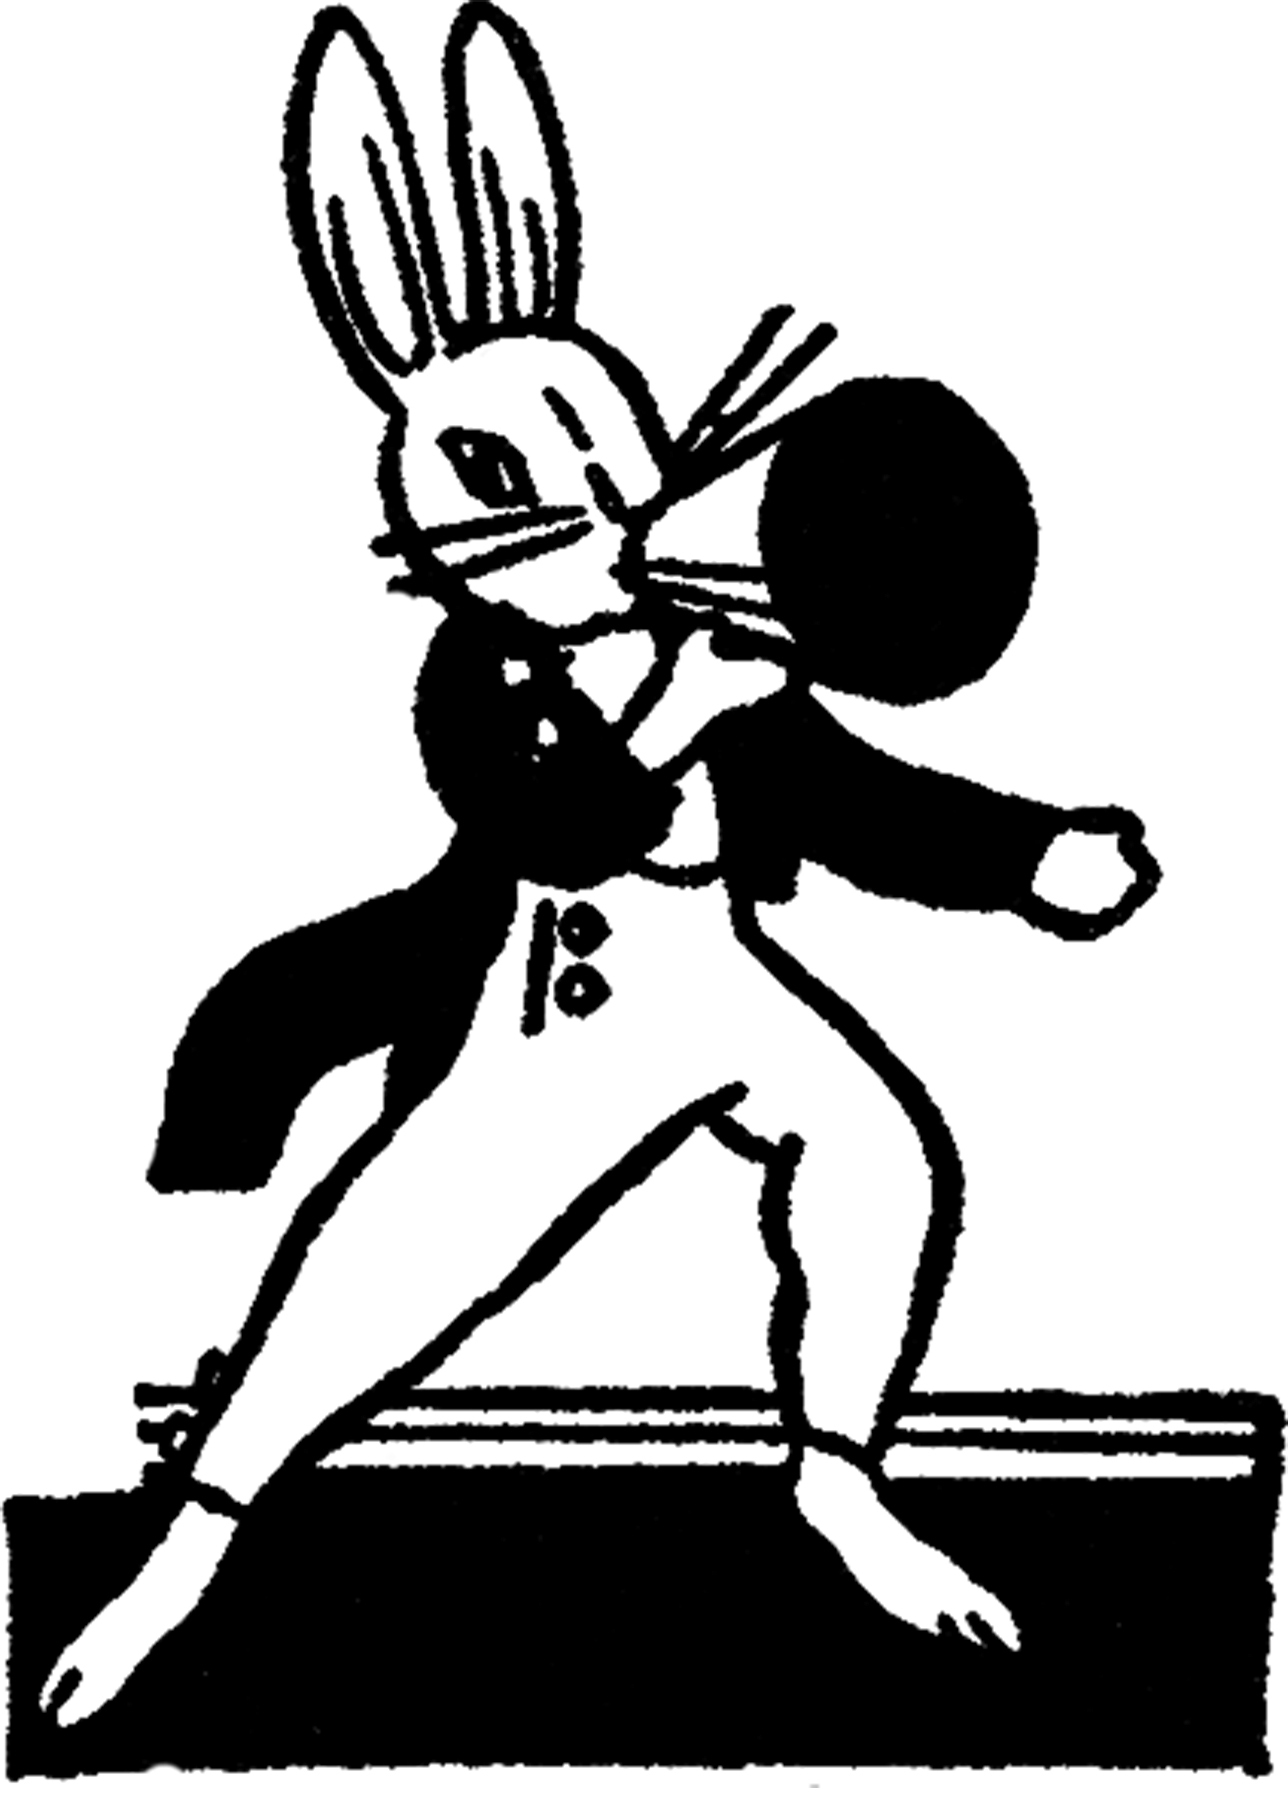 Vintage Megaphone Bunny Image The Graphics Fairy